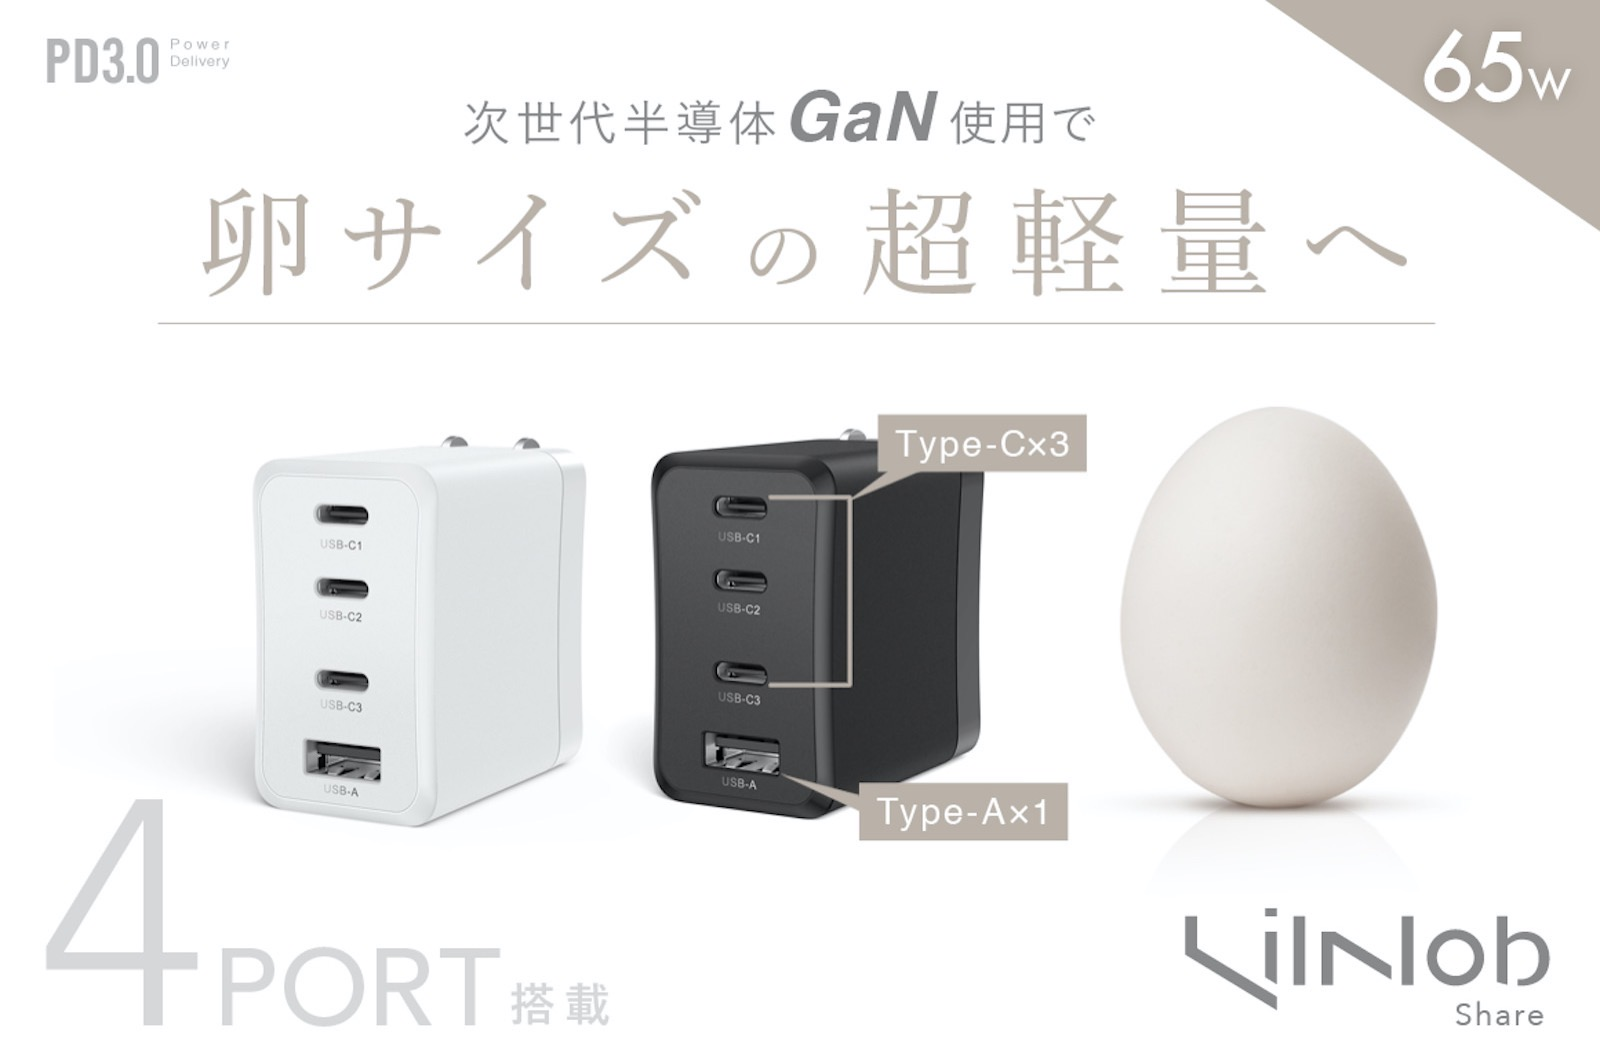 LilNob-Share-GaN-65W-charger.jpg